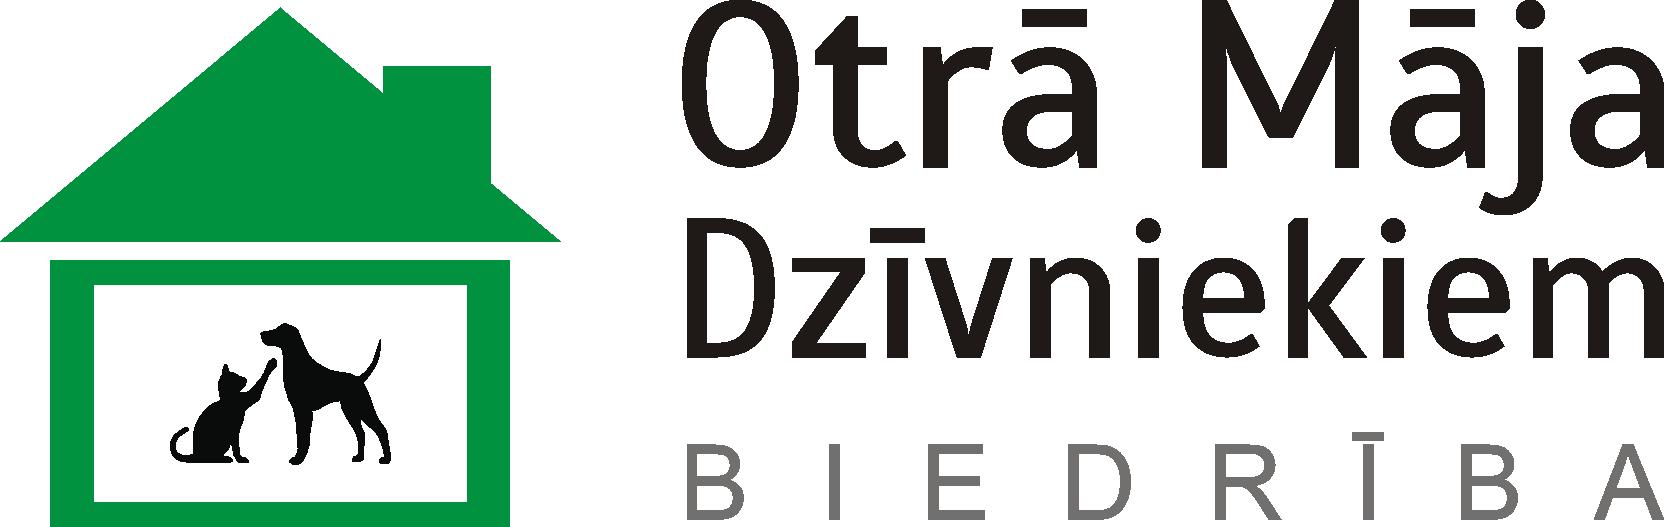 biedrība logo